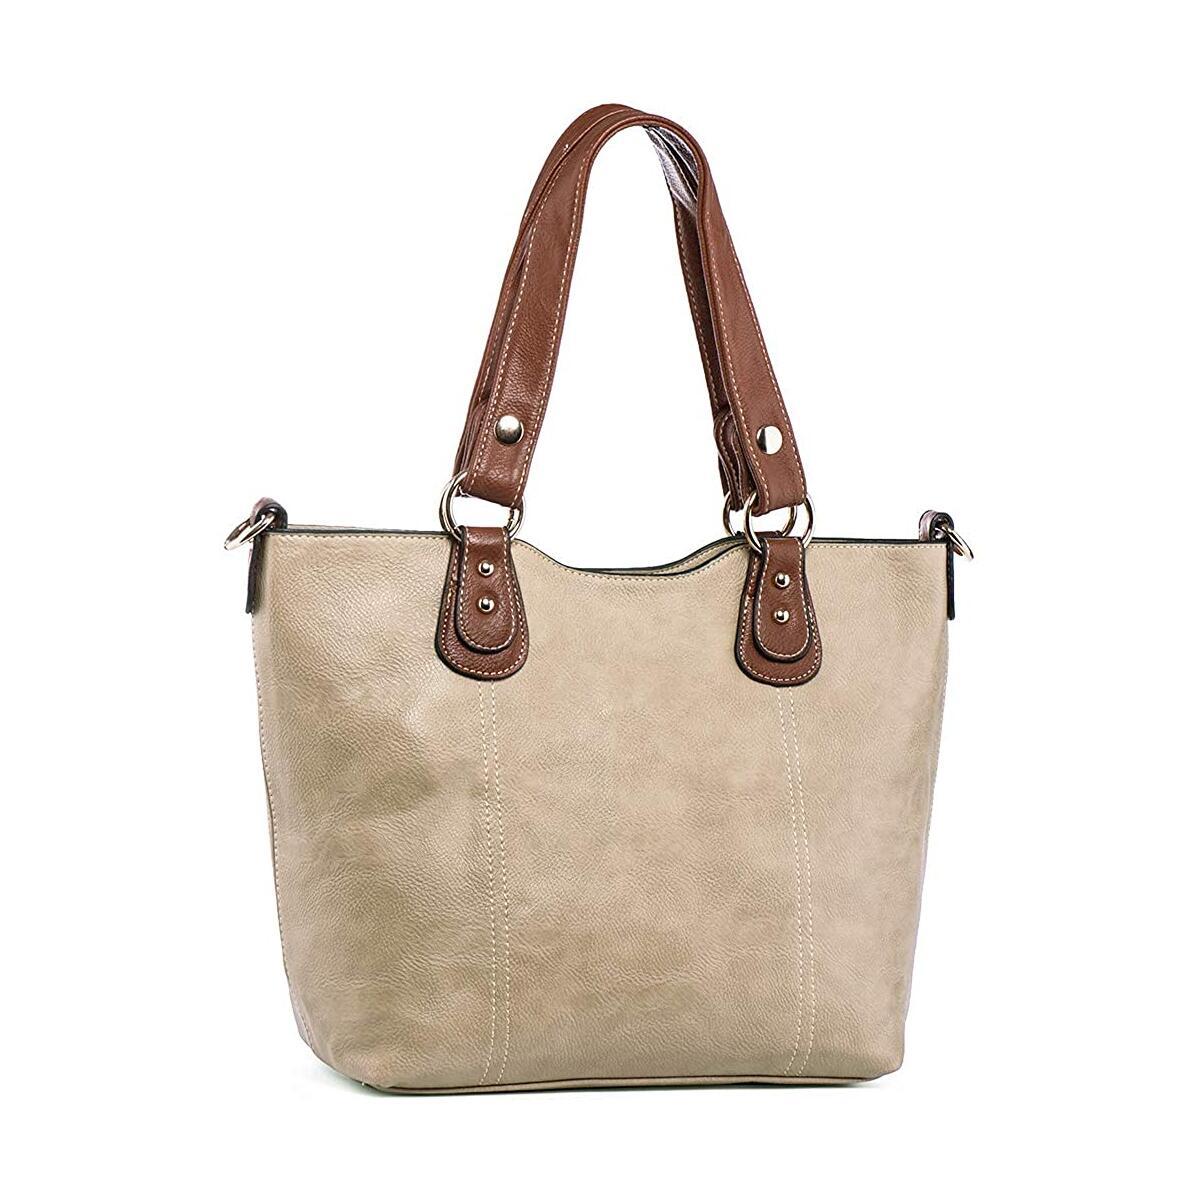 UTAKE Handbags for Women Tote Shoulder Bags PU Leather Top Handle Purse Medium Size Khaki